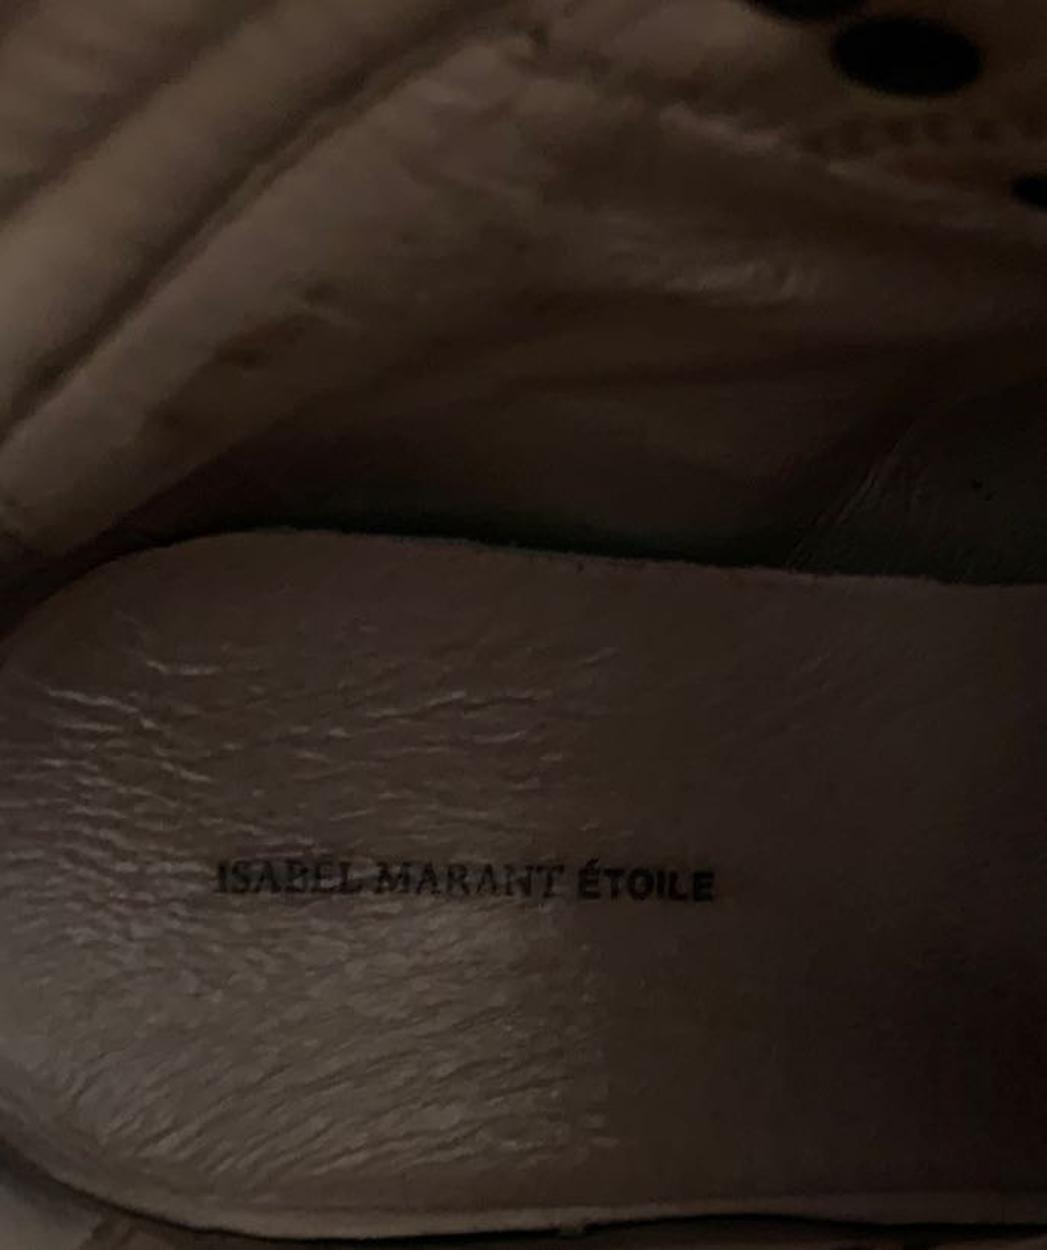 Isabel Marant Bot